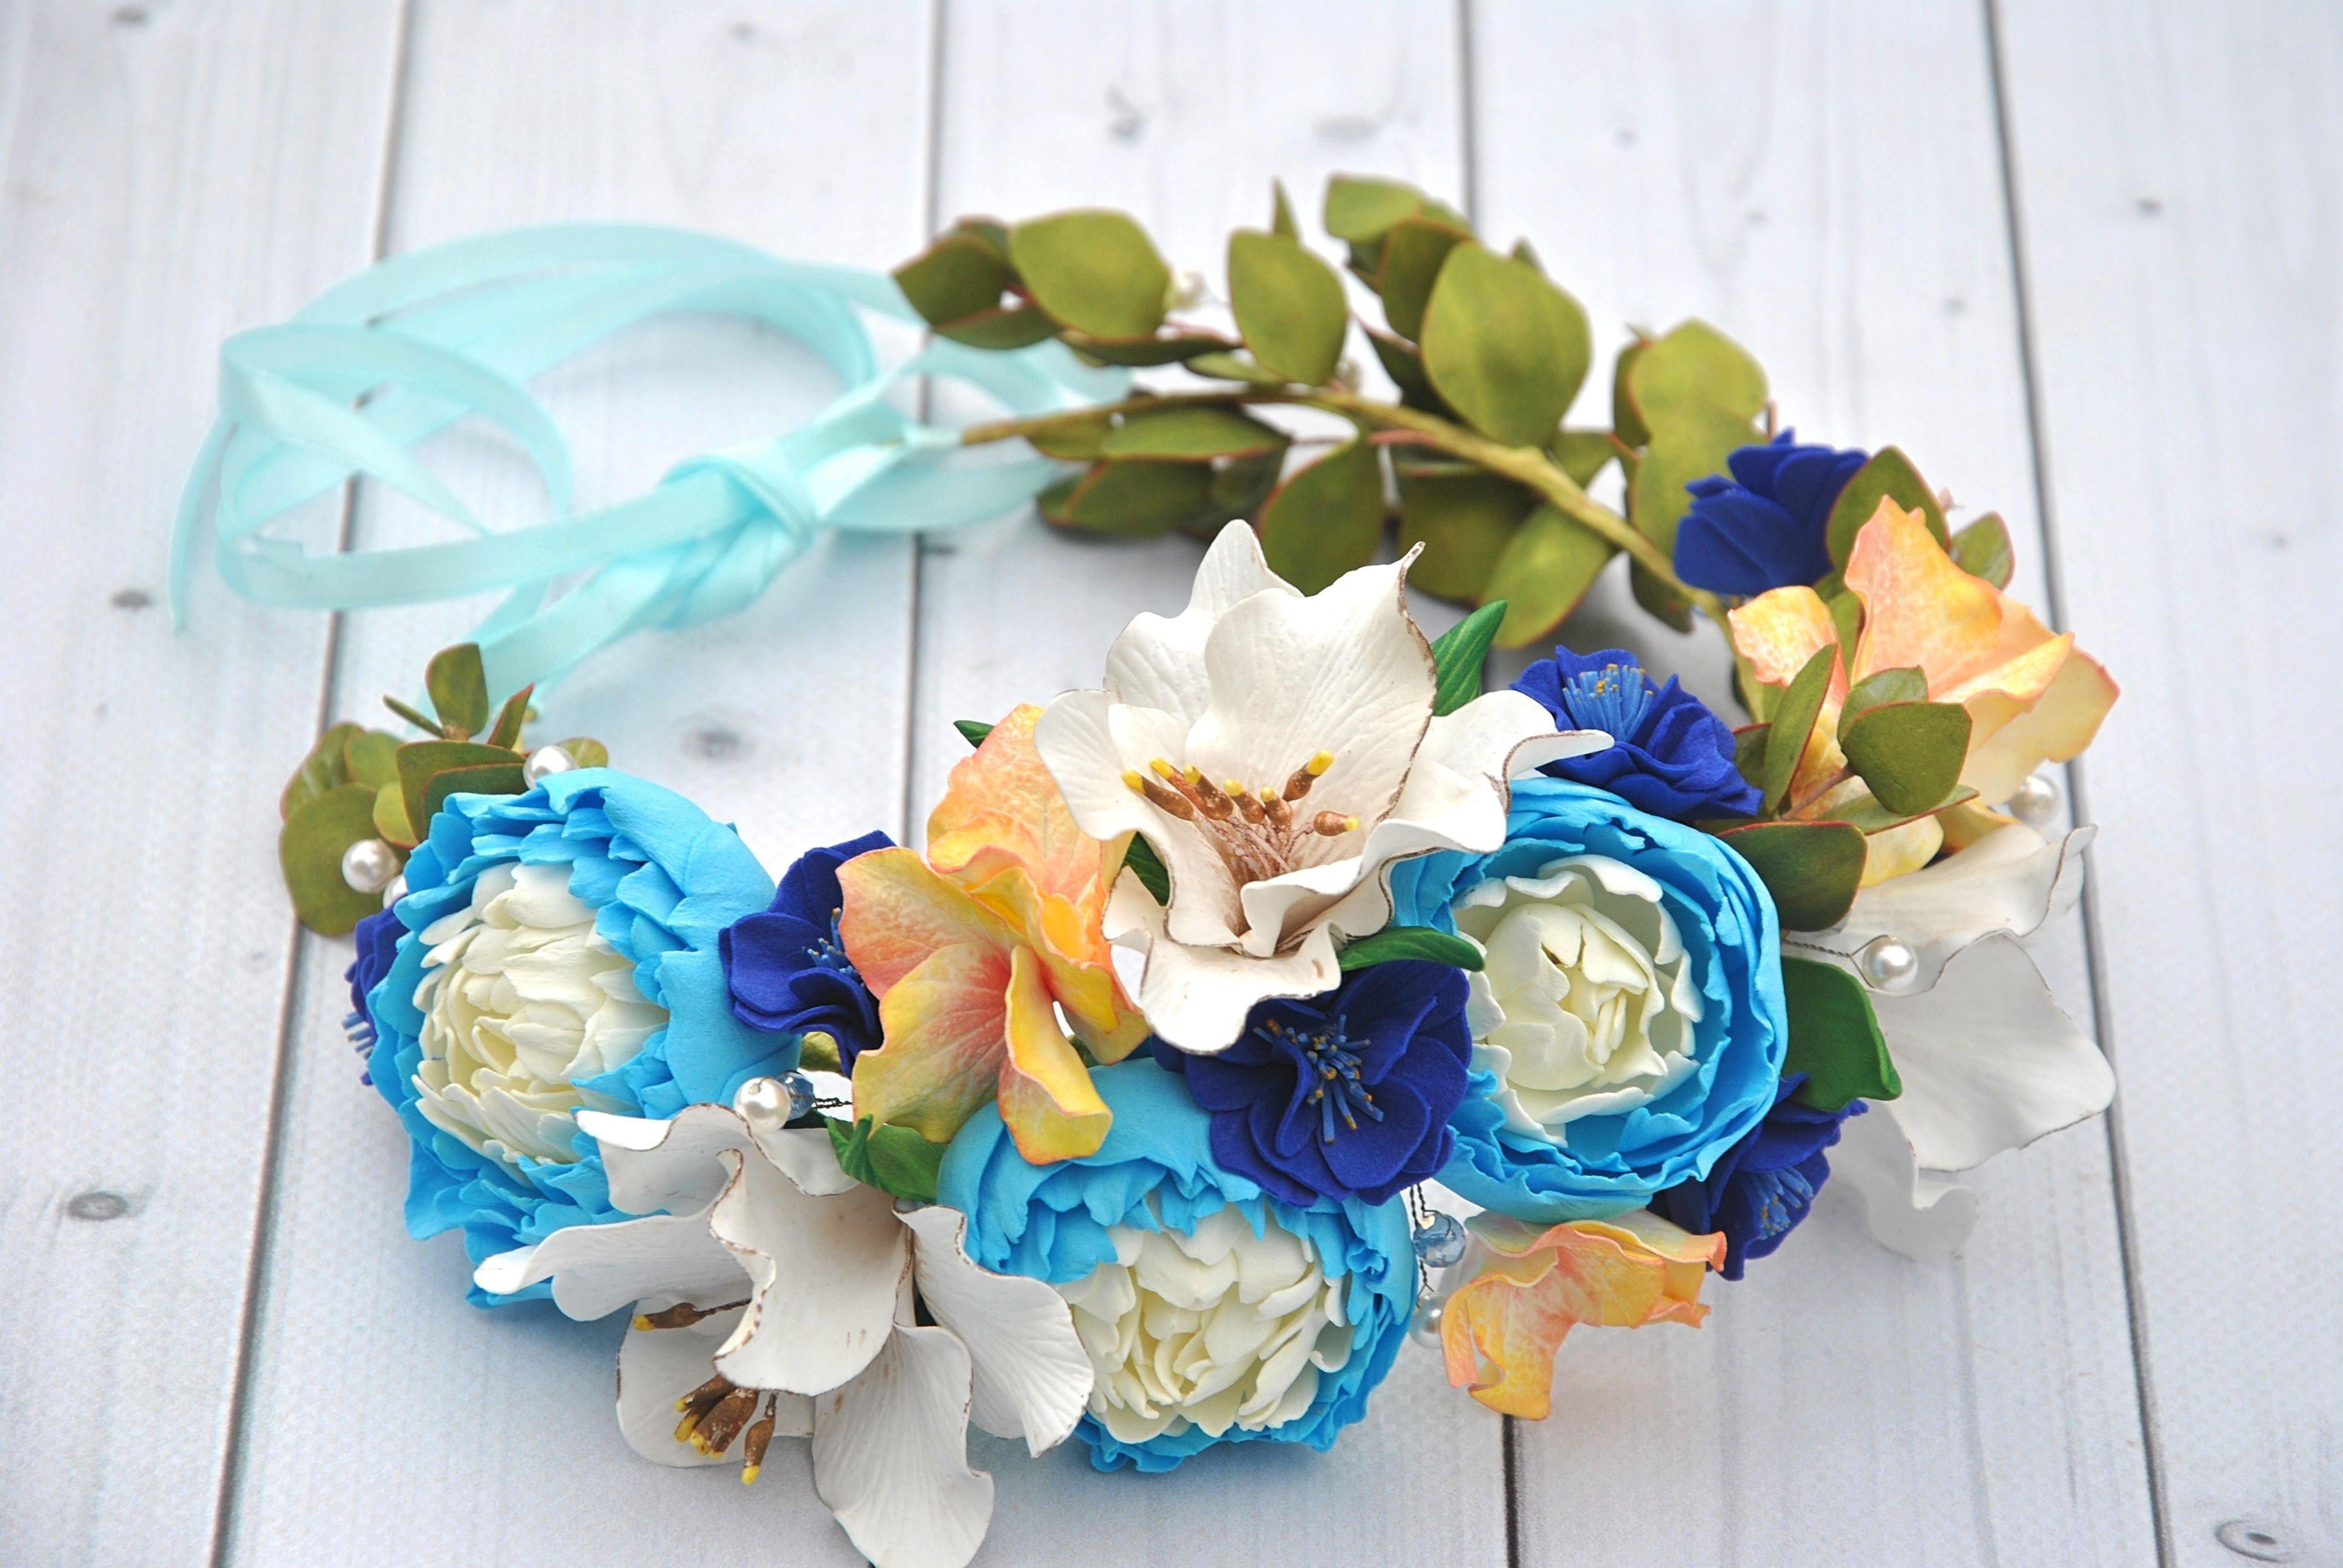 Flower wedding wreath peonies lily flower crown girls blue flowers flower wedding wreath peonies lily flower crown girls blue flowers crown boho hair wreath woodland crown izmirmasajfo